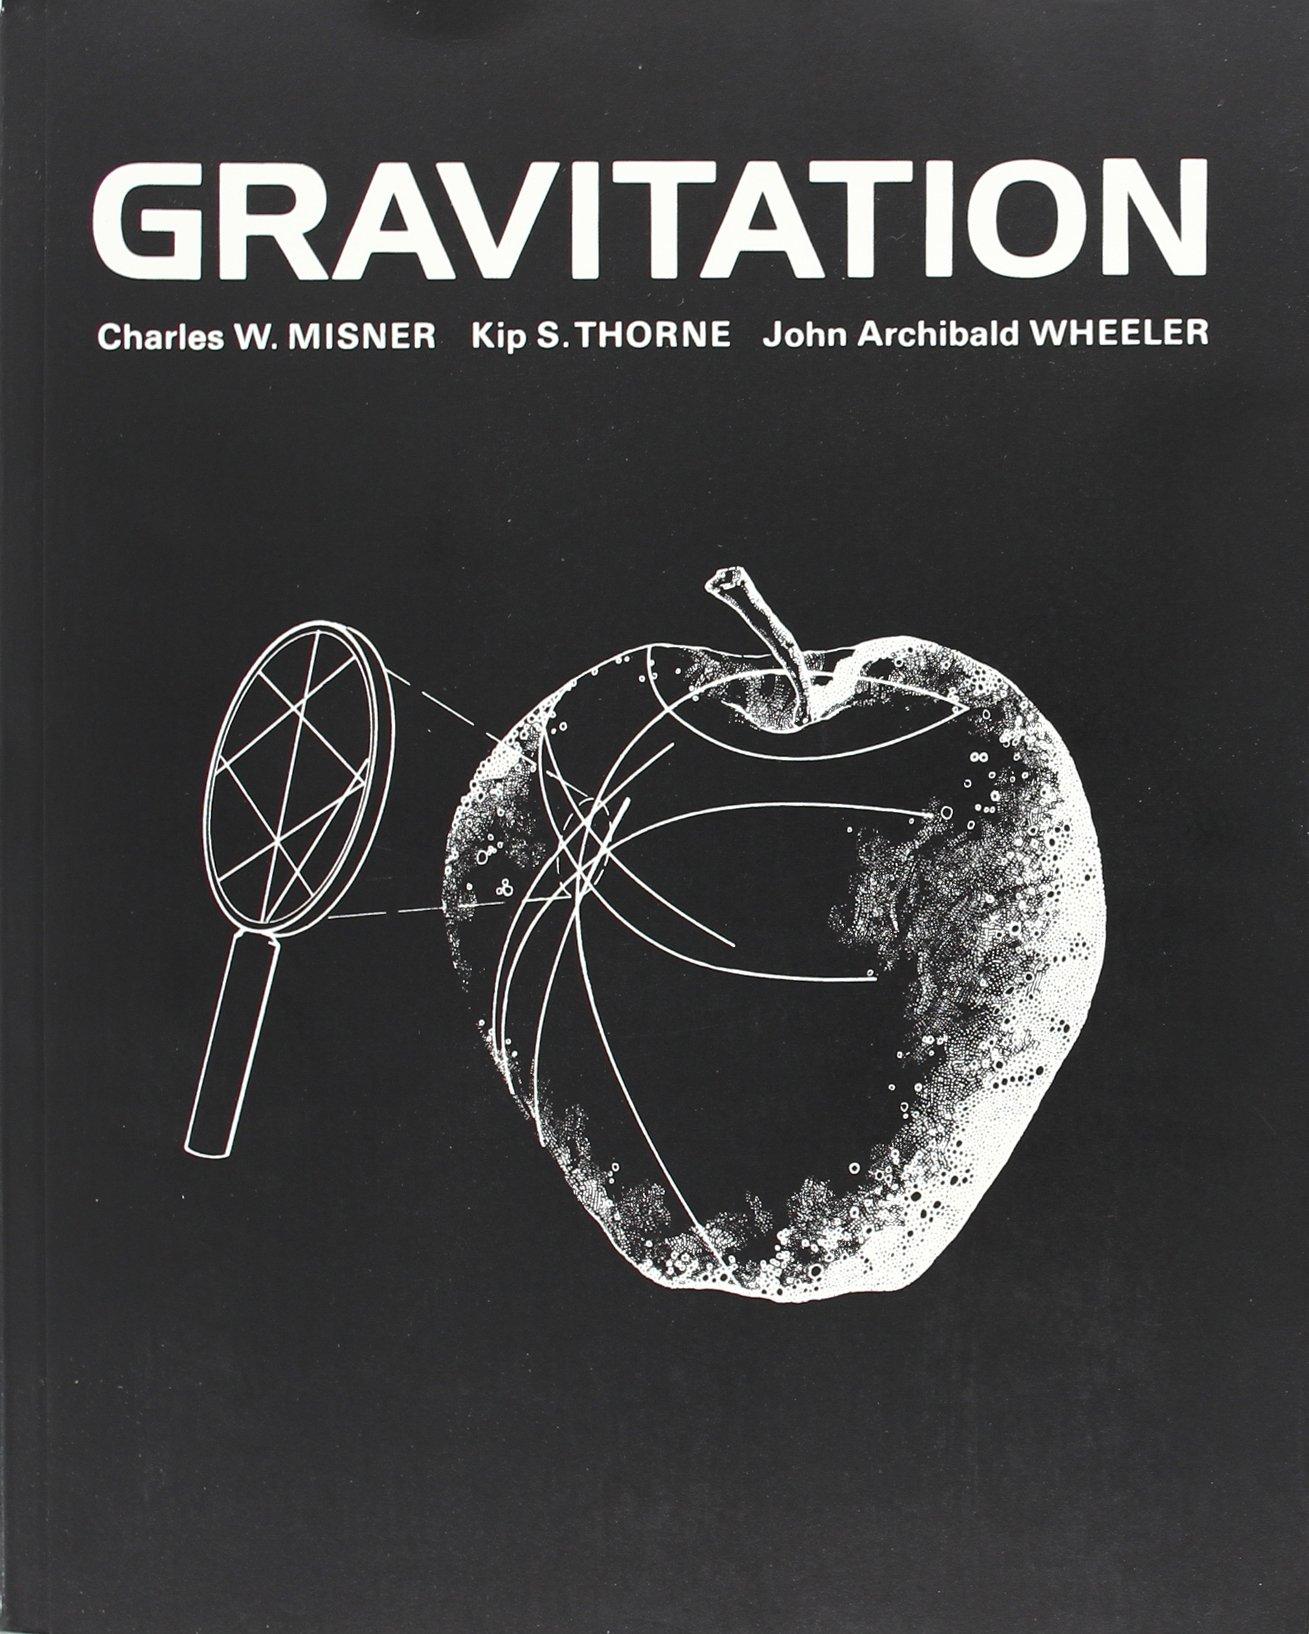 3.Gravitation